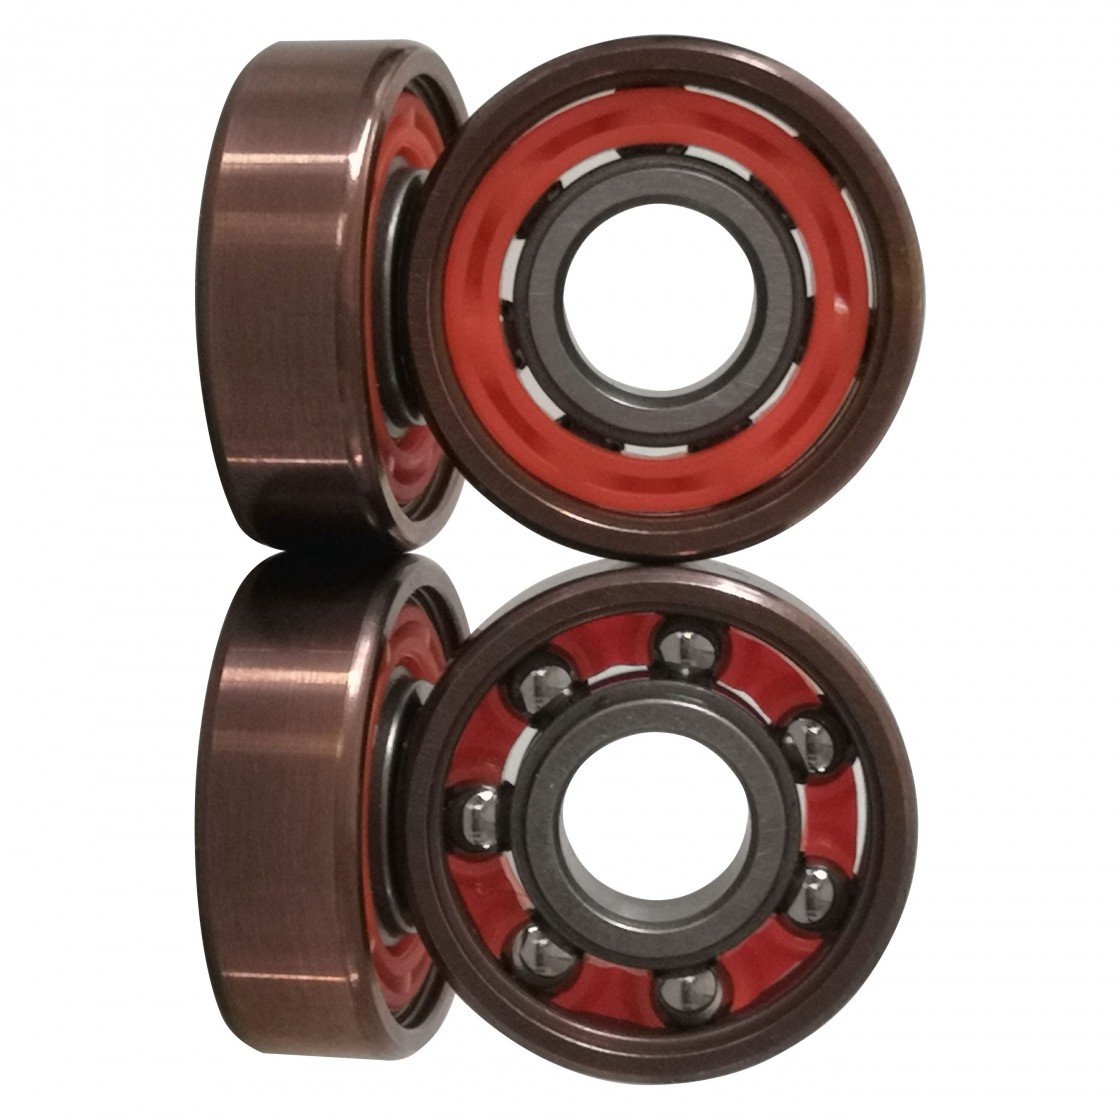 NTN NSK NACHI Stainless Steel Deep Groove Ball Bearing for Merry Go Round/Fishing Reel Ball Bearing 6206 6301 6204 6904